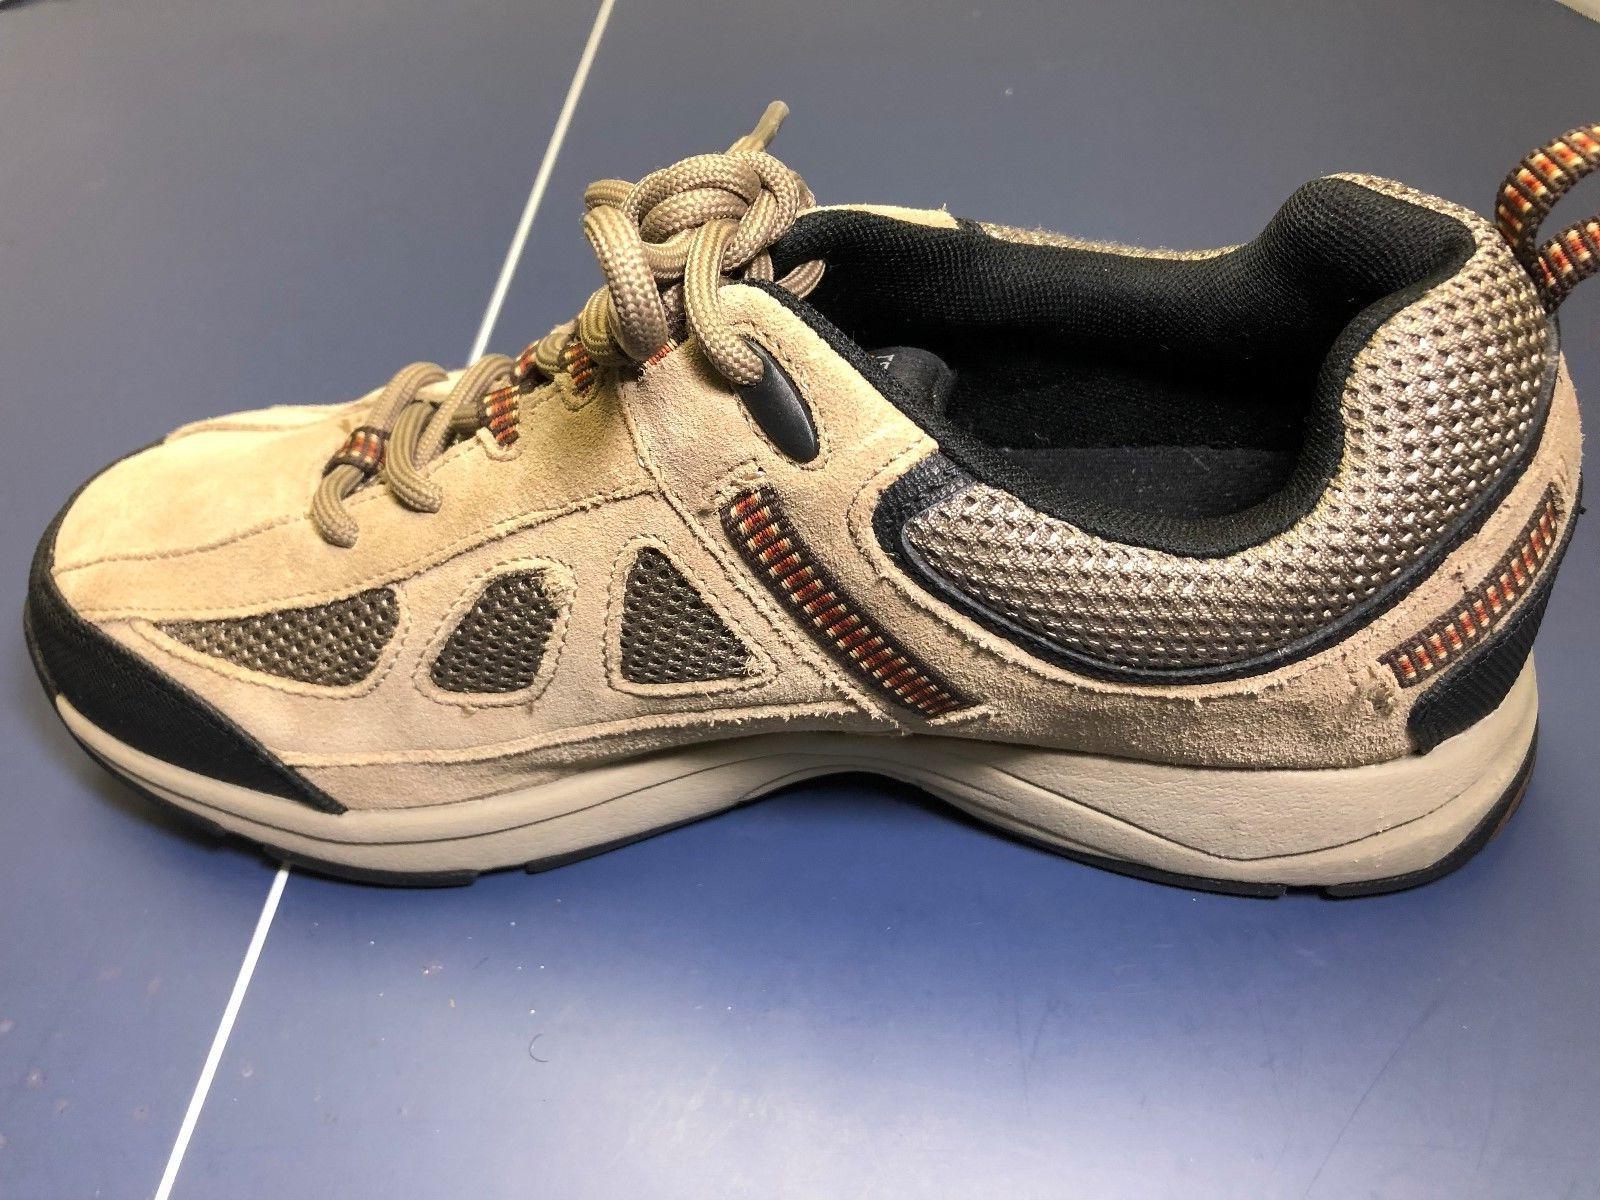 New Walkability Tennis Shoes Mens Adiprene